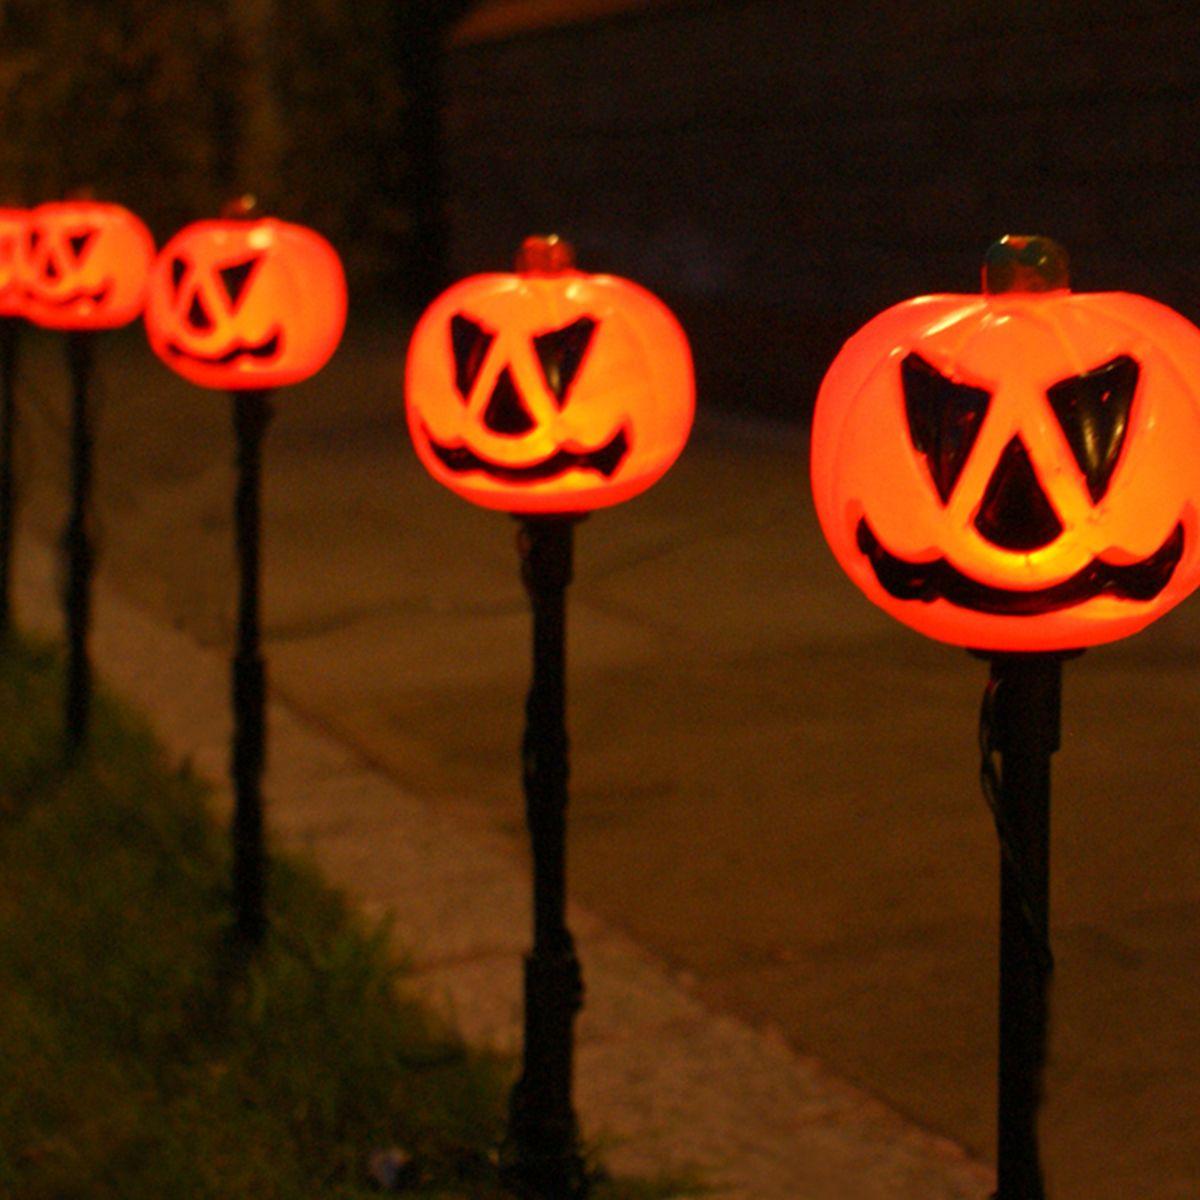 Outdoor Plug In Halloween Pumpkin Stake Lights, 5 Pack